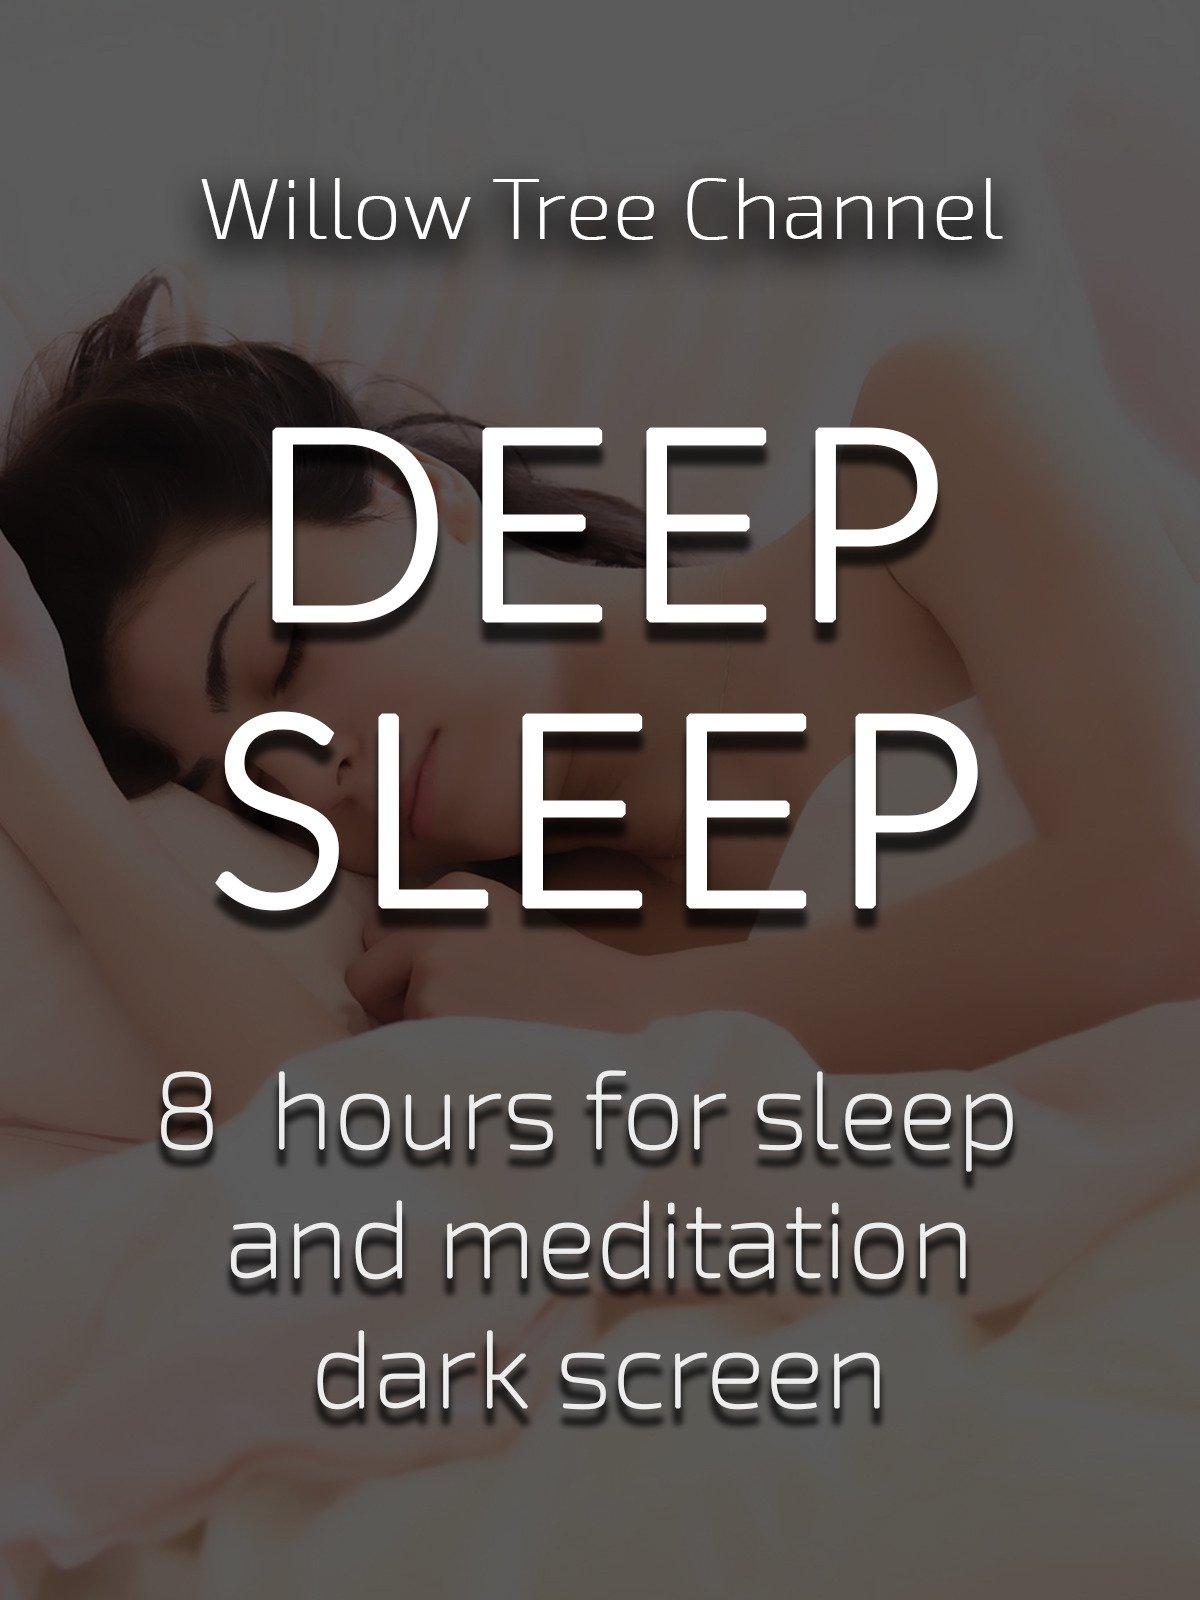 Deep sleep, 8 hours for Sleep and Meditation, dark screen